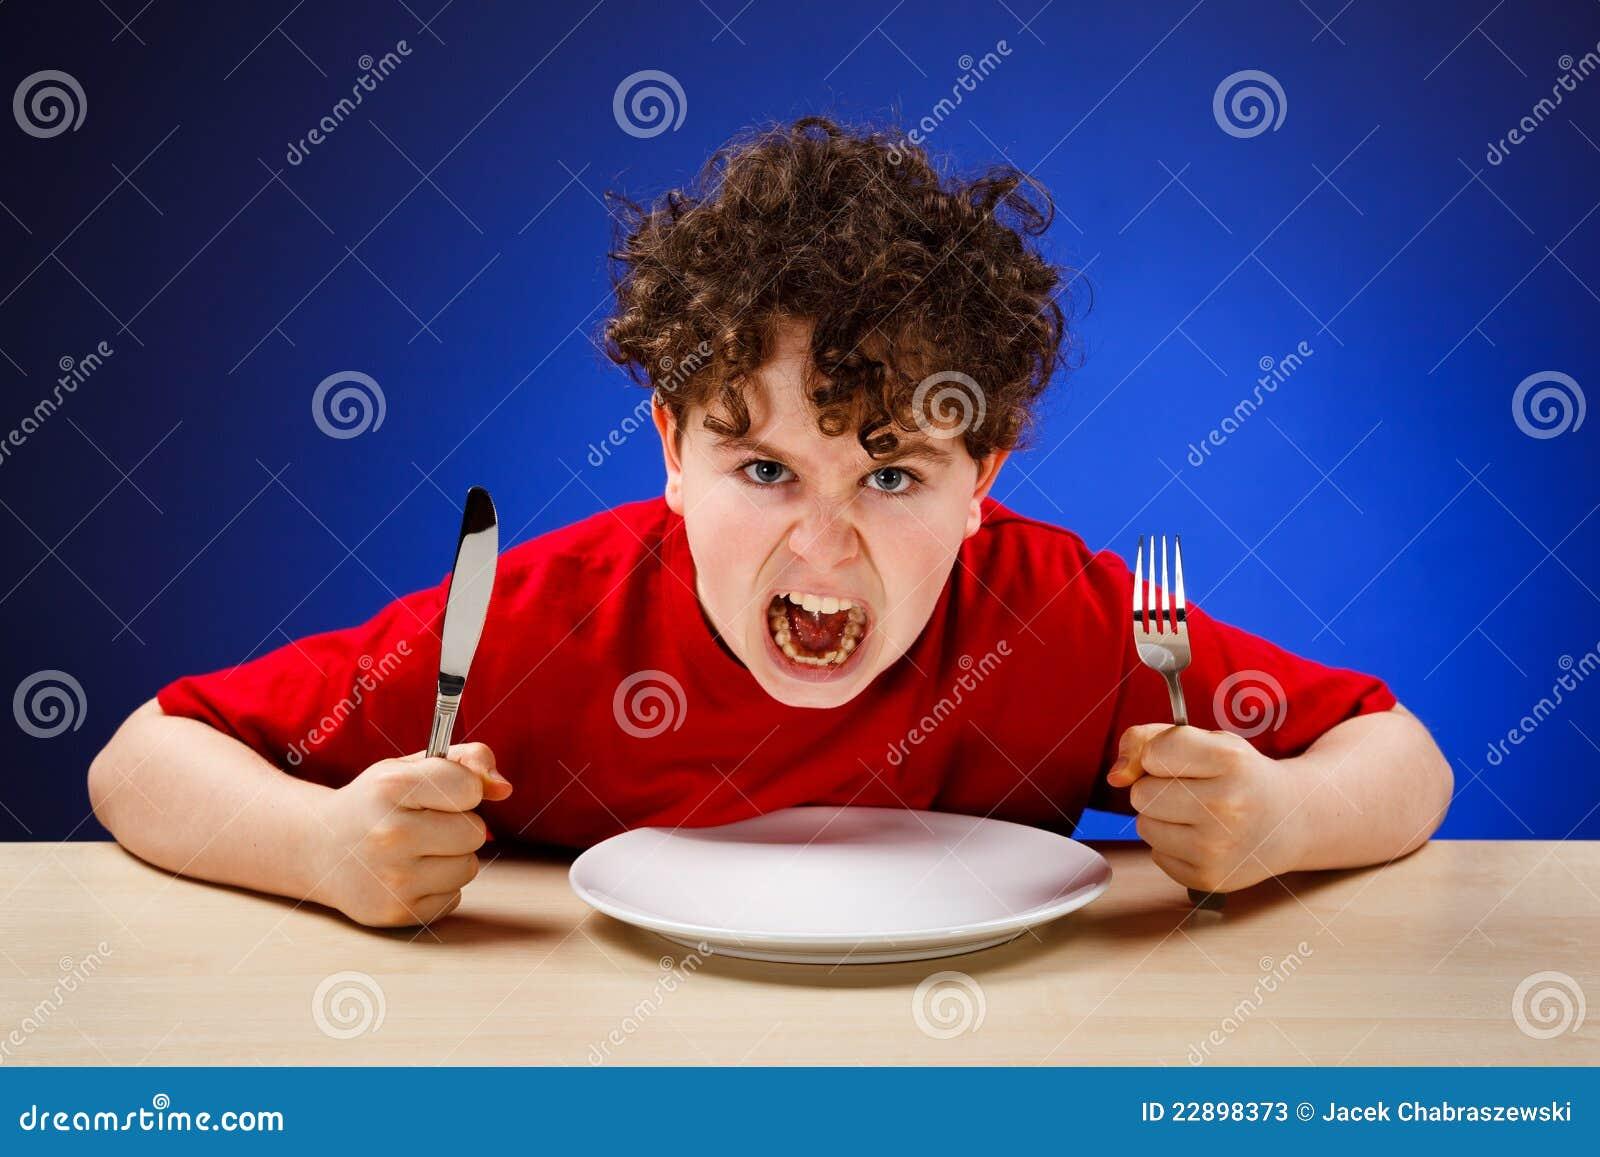 Hungry Boy Stock Photos Image 22898373